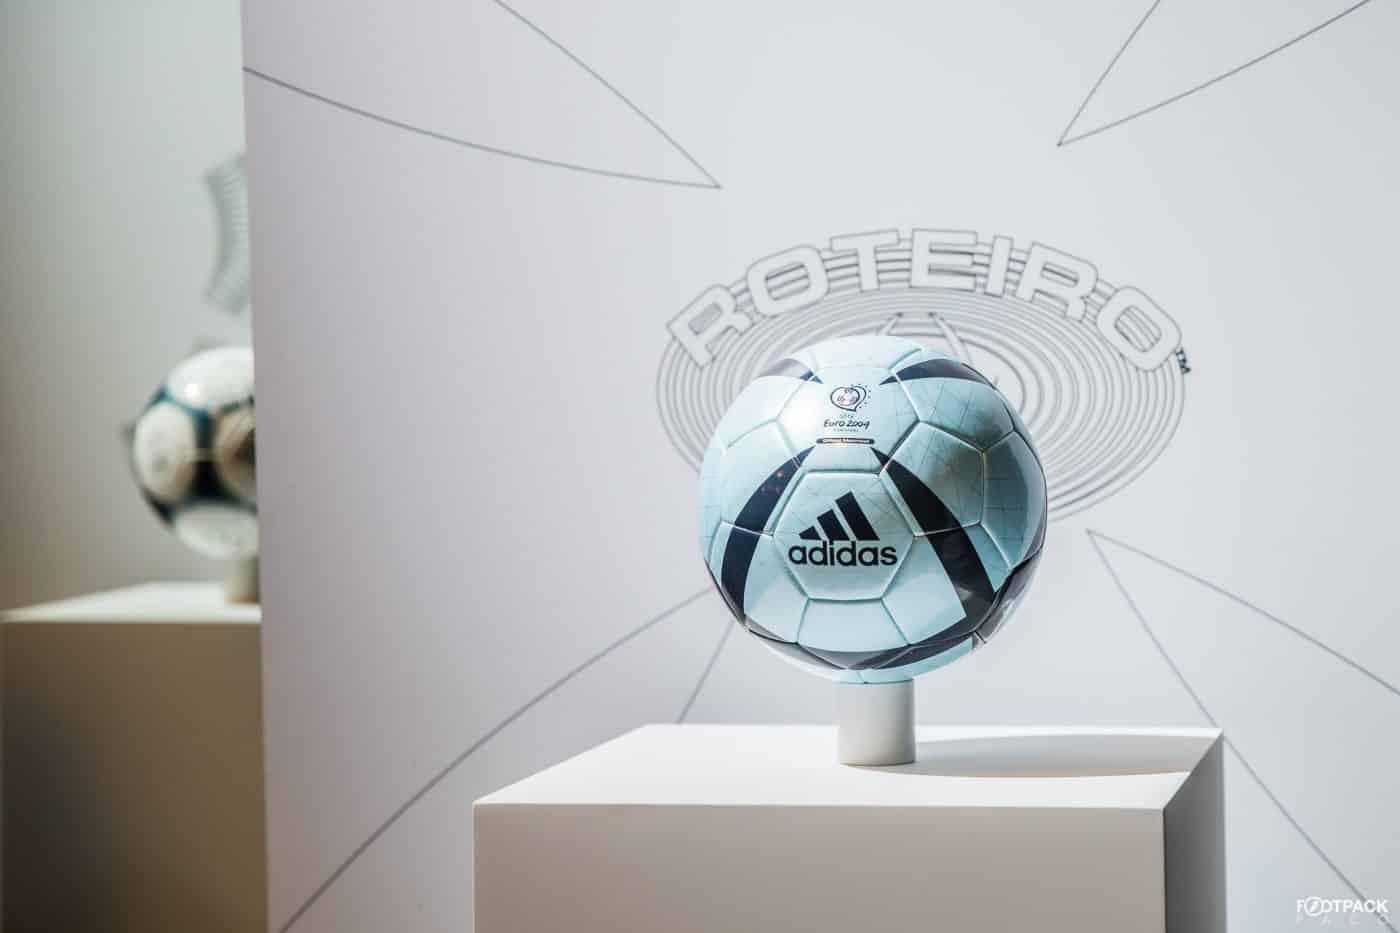 ballon-football-adidas-euro-2004-footpack-2019-2